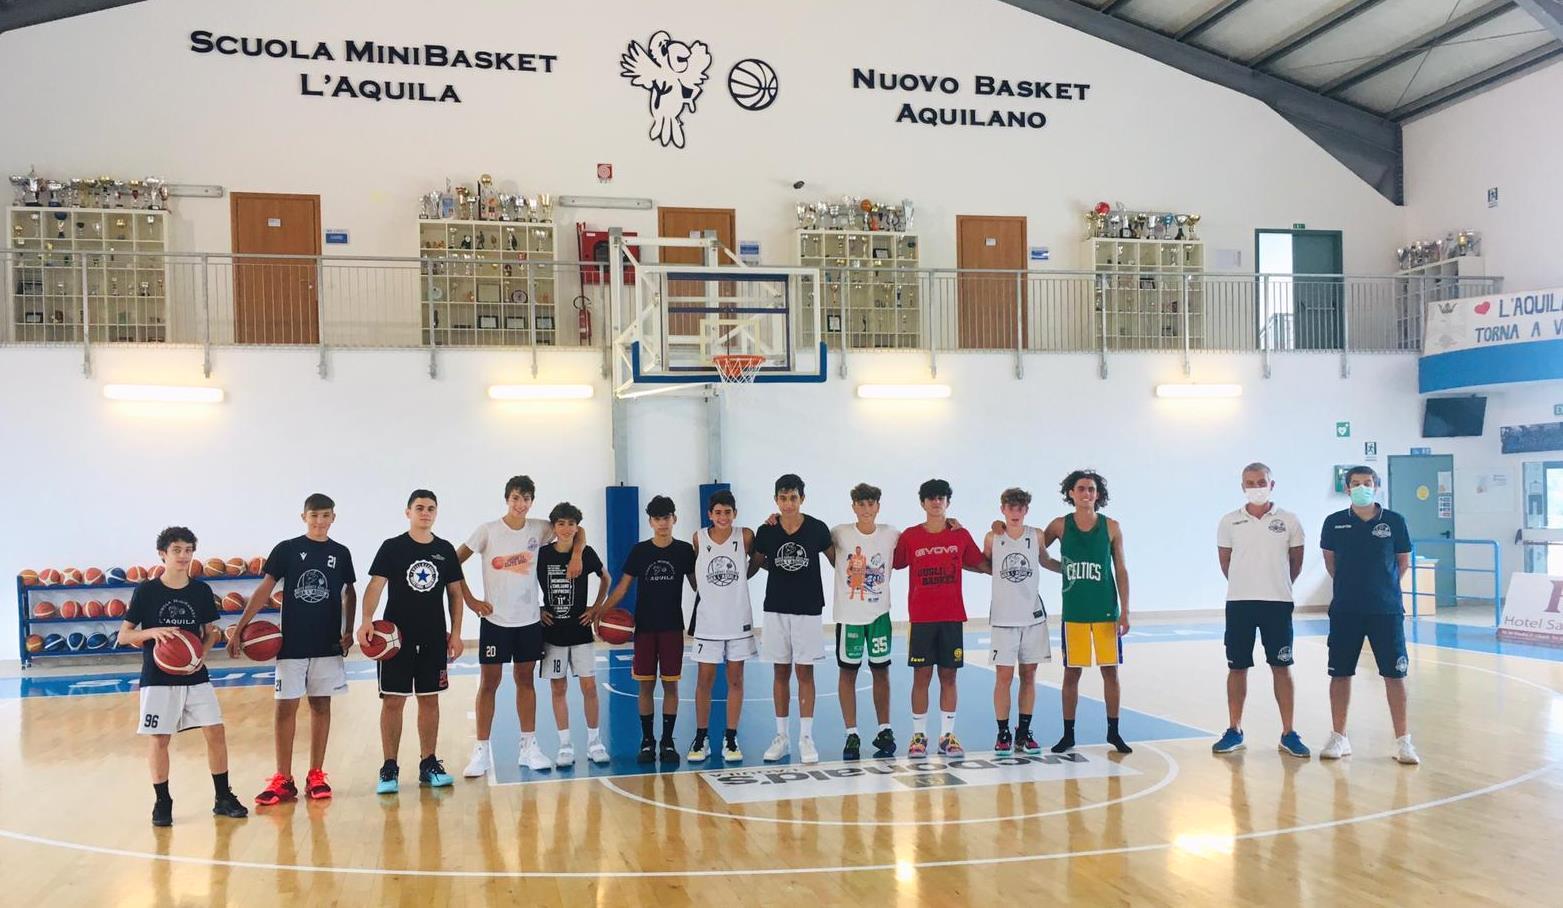 Un gruppo del vivaio del Nuovo Basket Aquilano